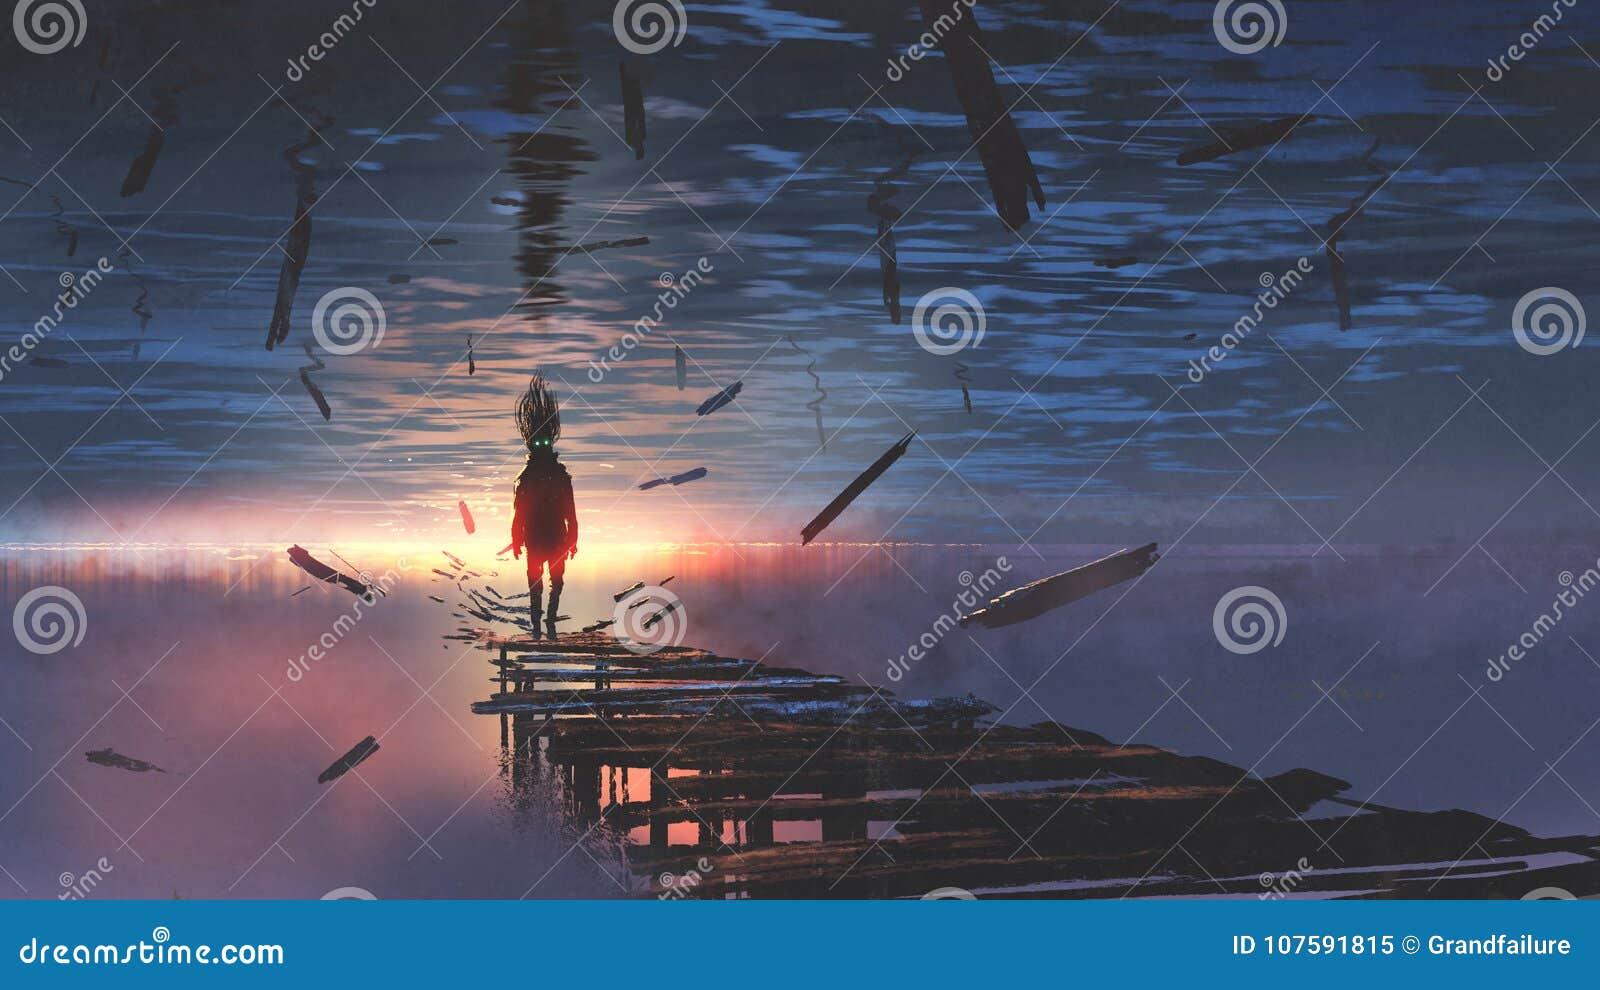 Upside Down World Clipart